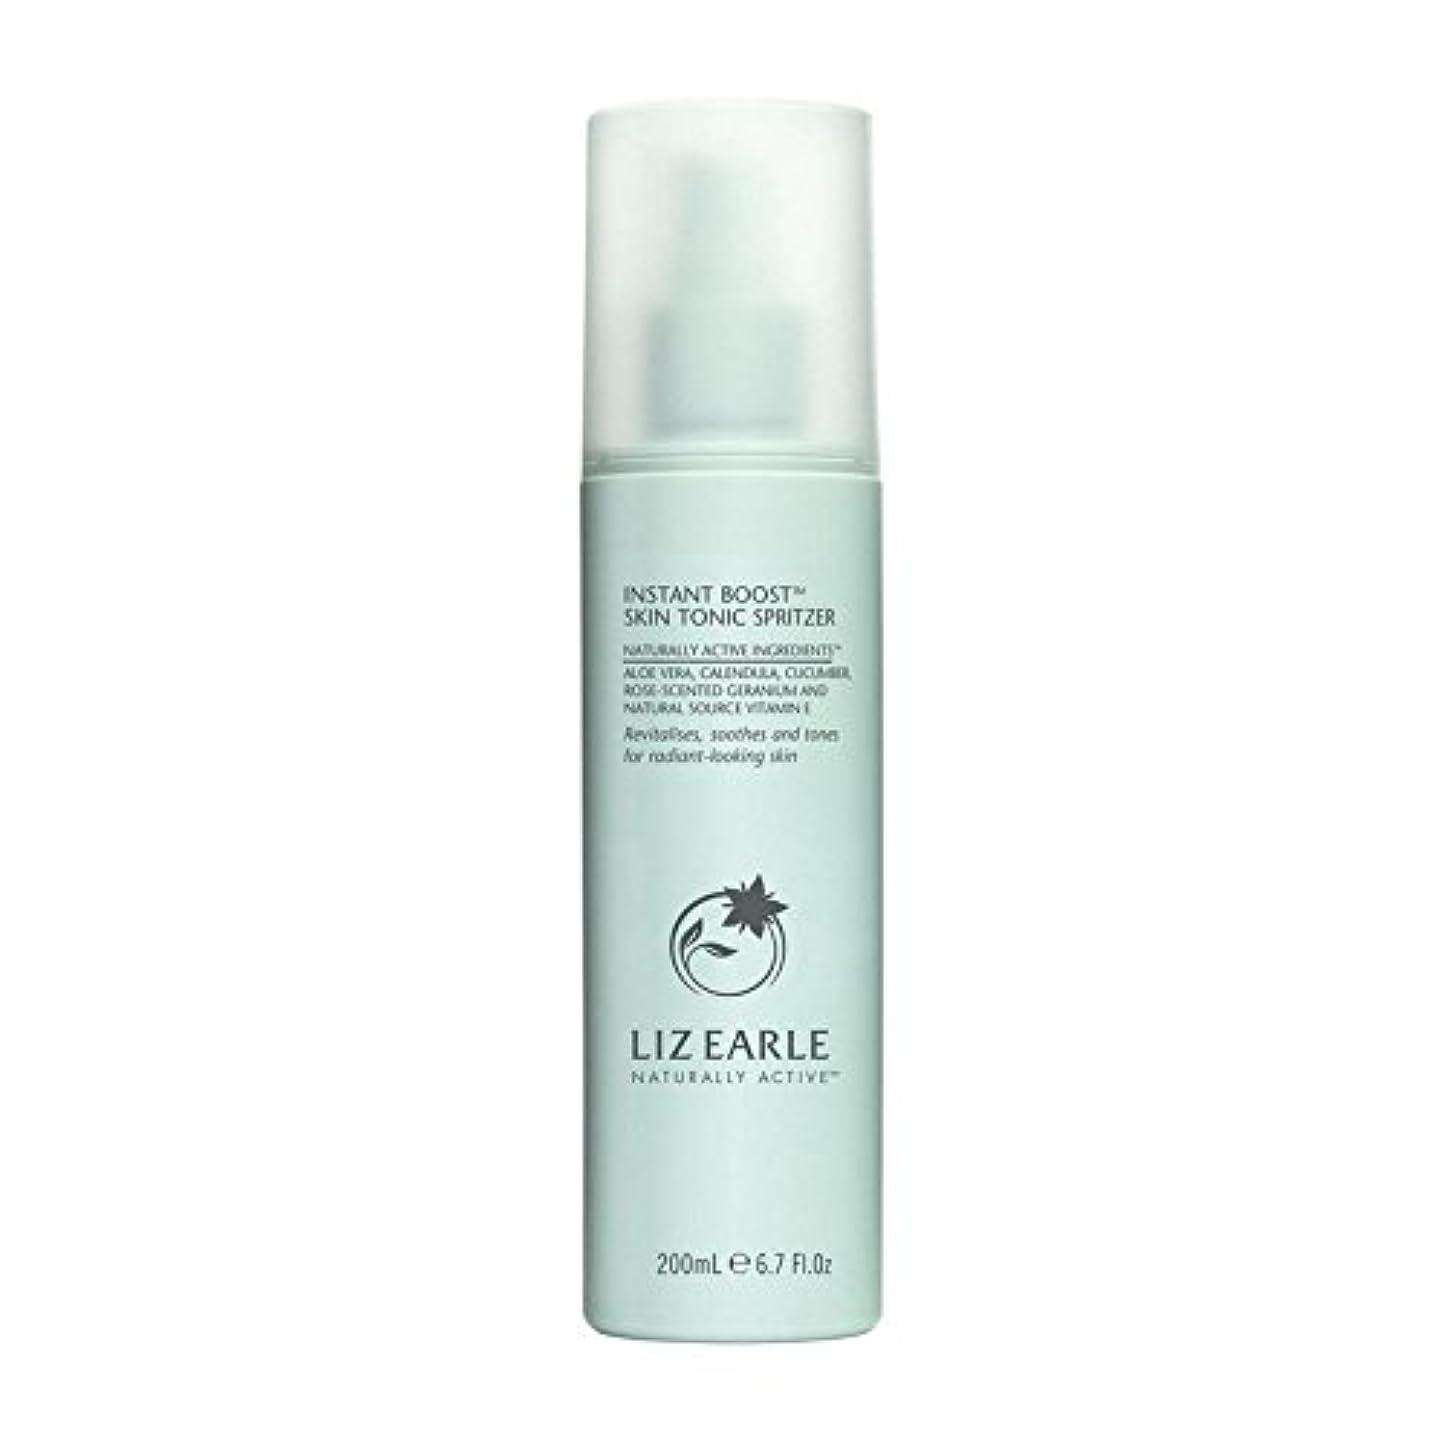 Liz Earle Instant Boost Skin Tonic Spritzer 200ml - リズアールインスタントブーストスキントニックスプリッツァーの200ミリリットル [並行輸入品]